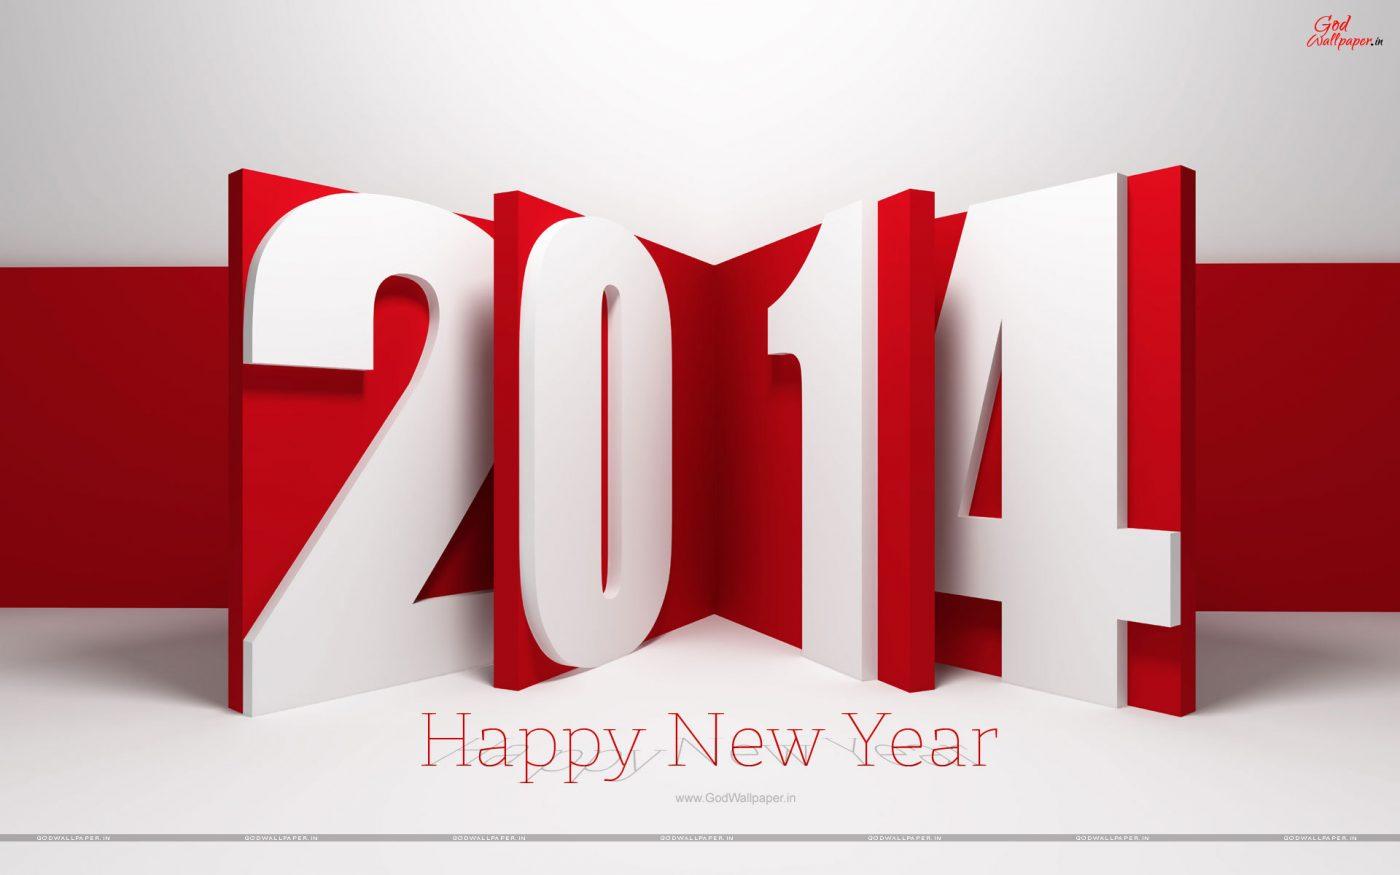 2014-happy-new-year-logo-hd-wallpaper – dcr 97.4fm